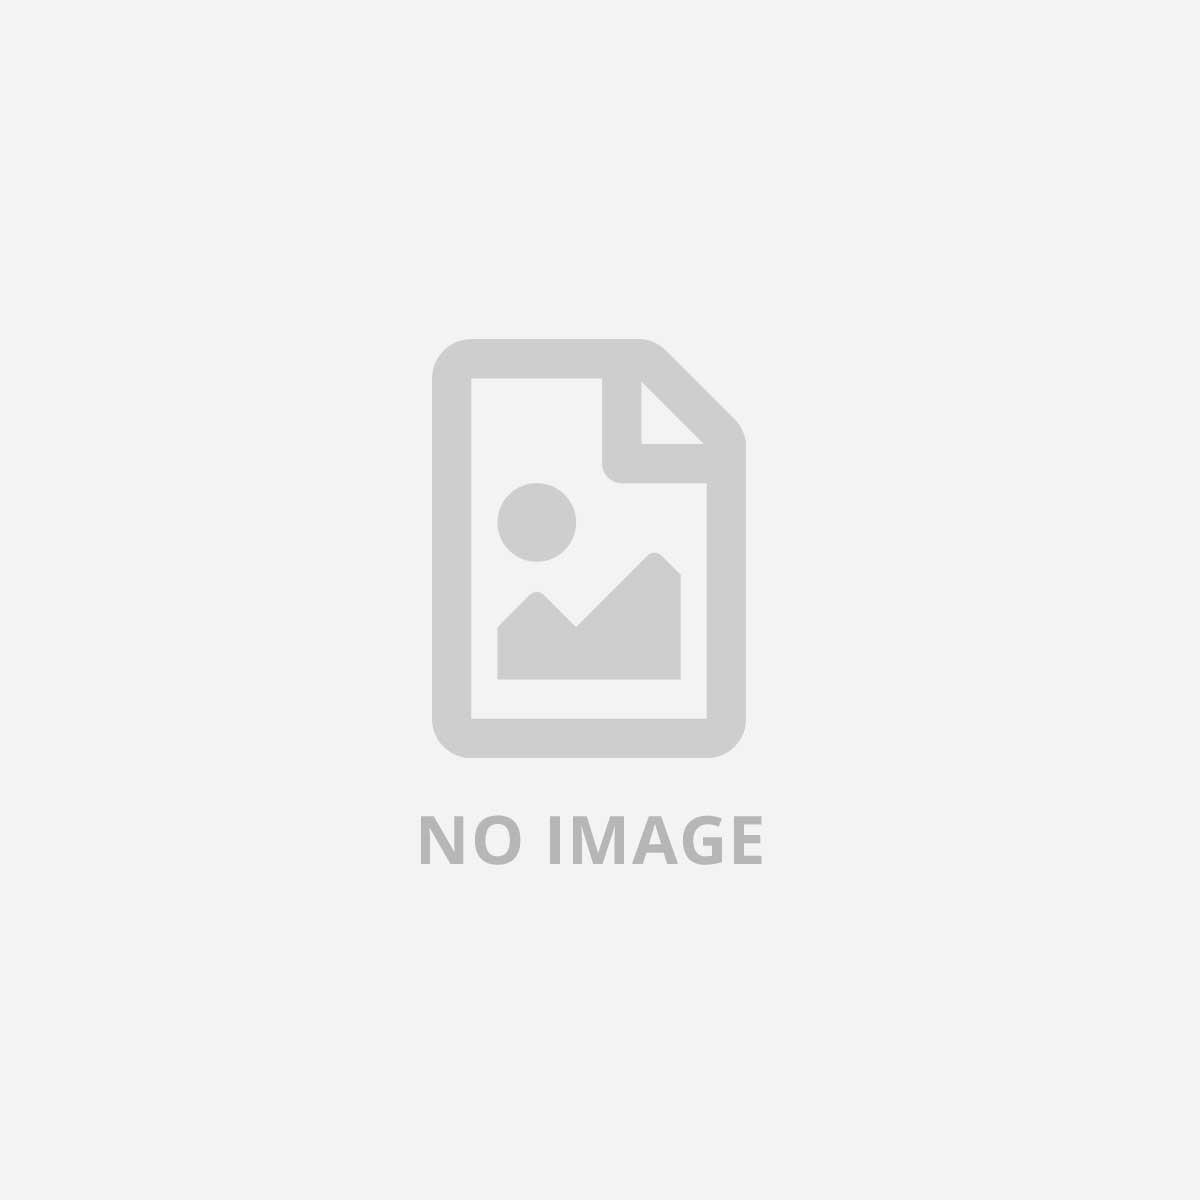 CANON EXCHANGE ROLLER X P-150